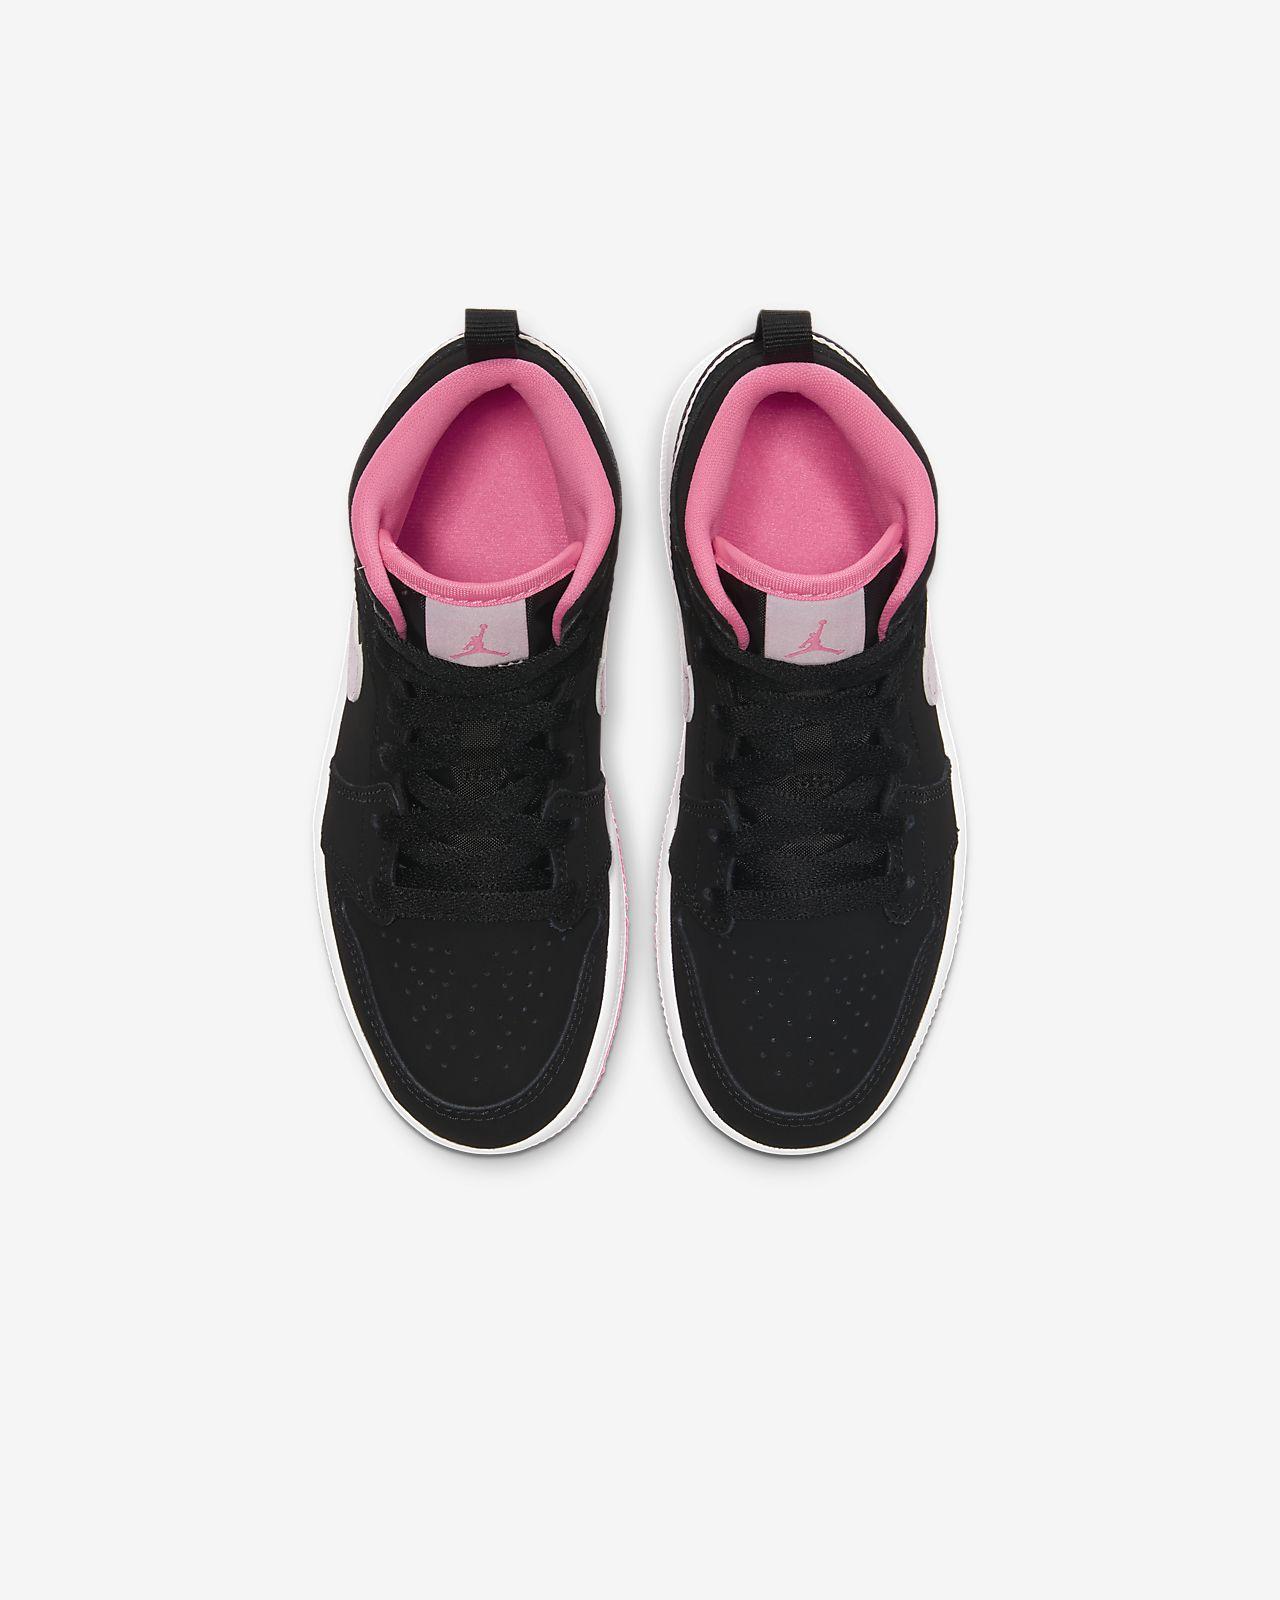 Sapatilhas Air Jordan 1 Mid para criança